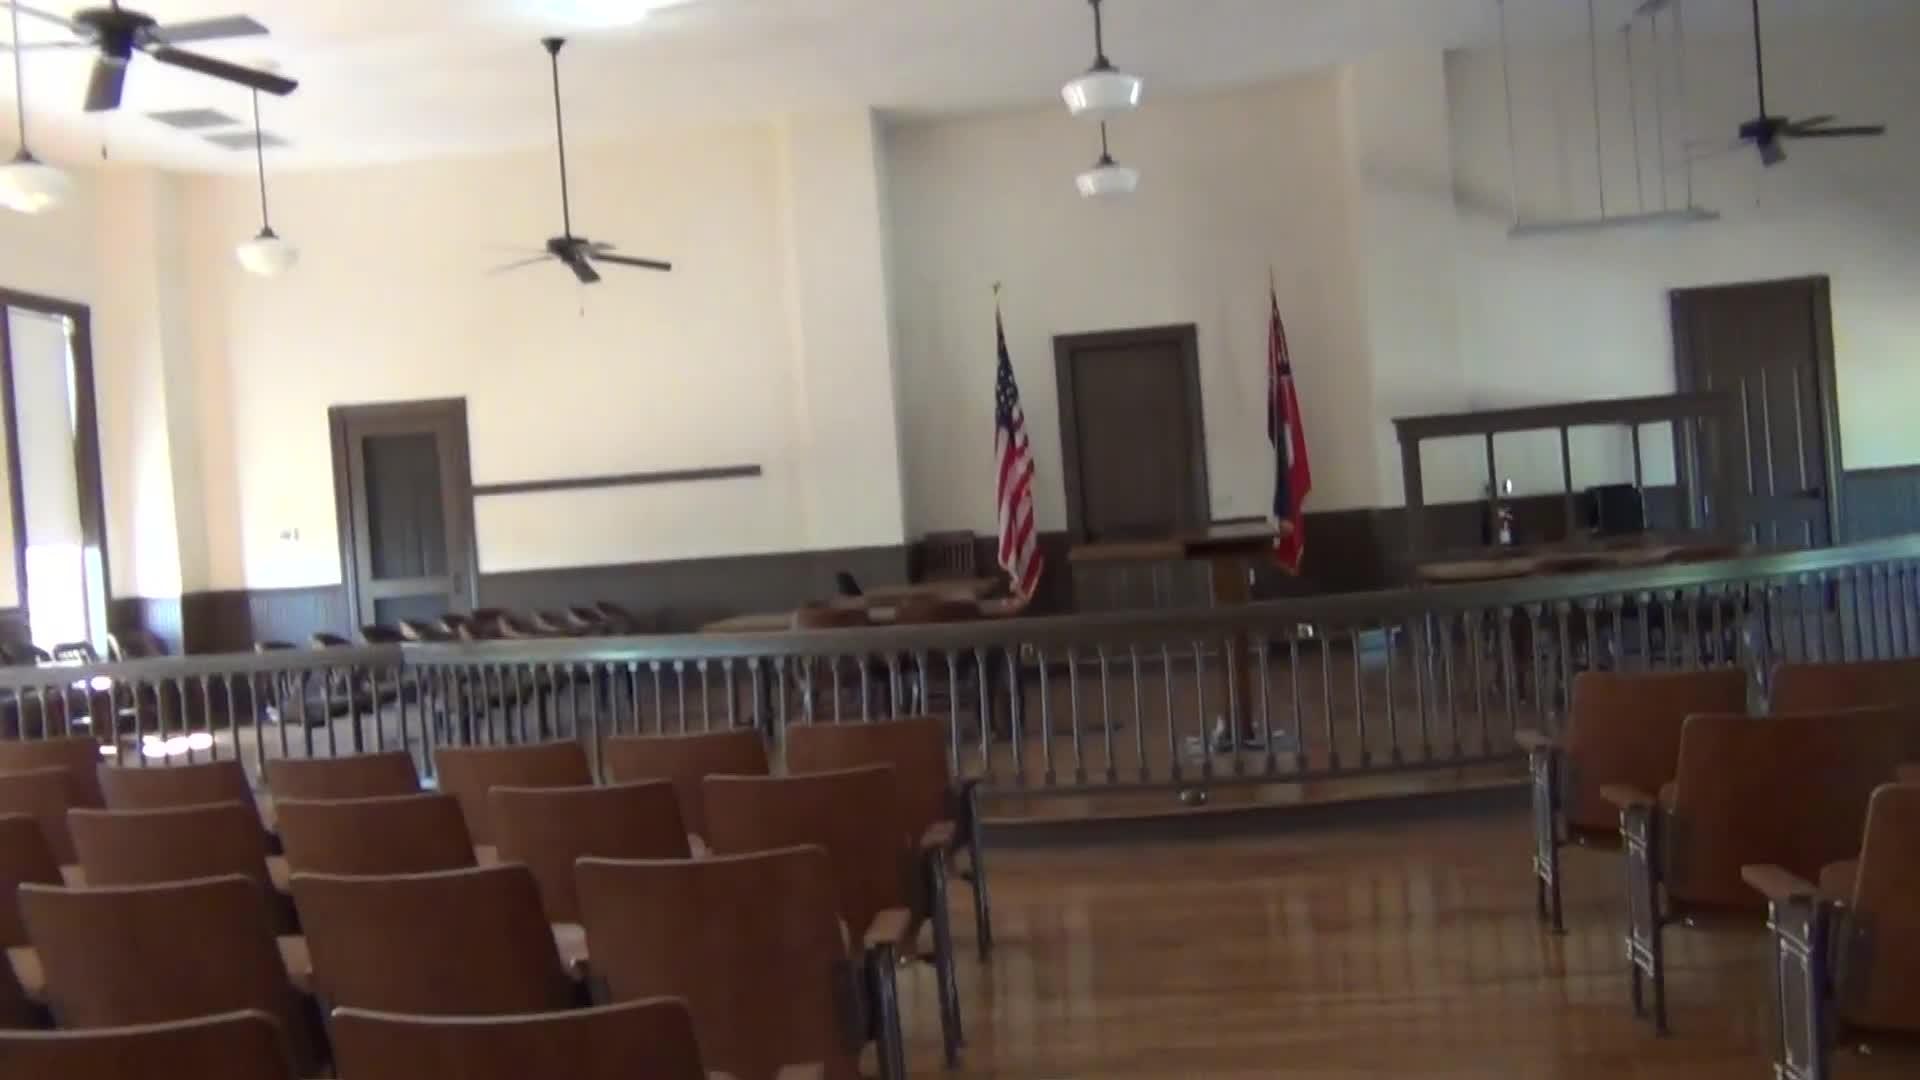 Sumner Courthouse Tour